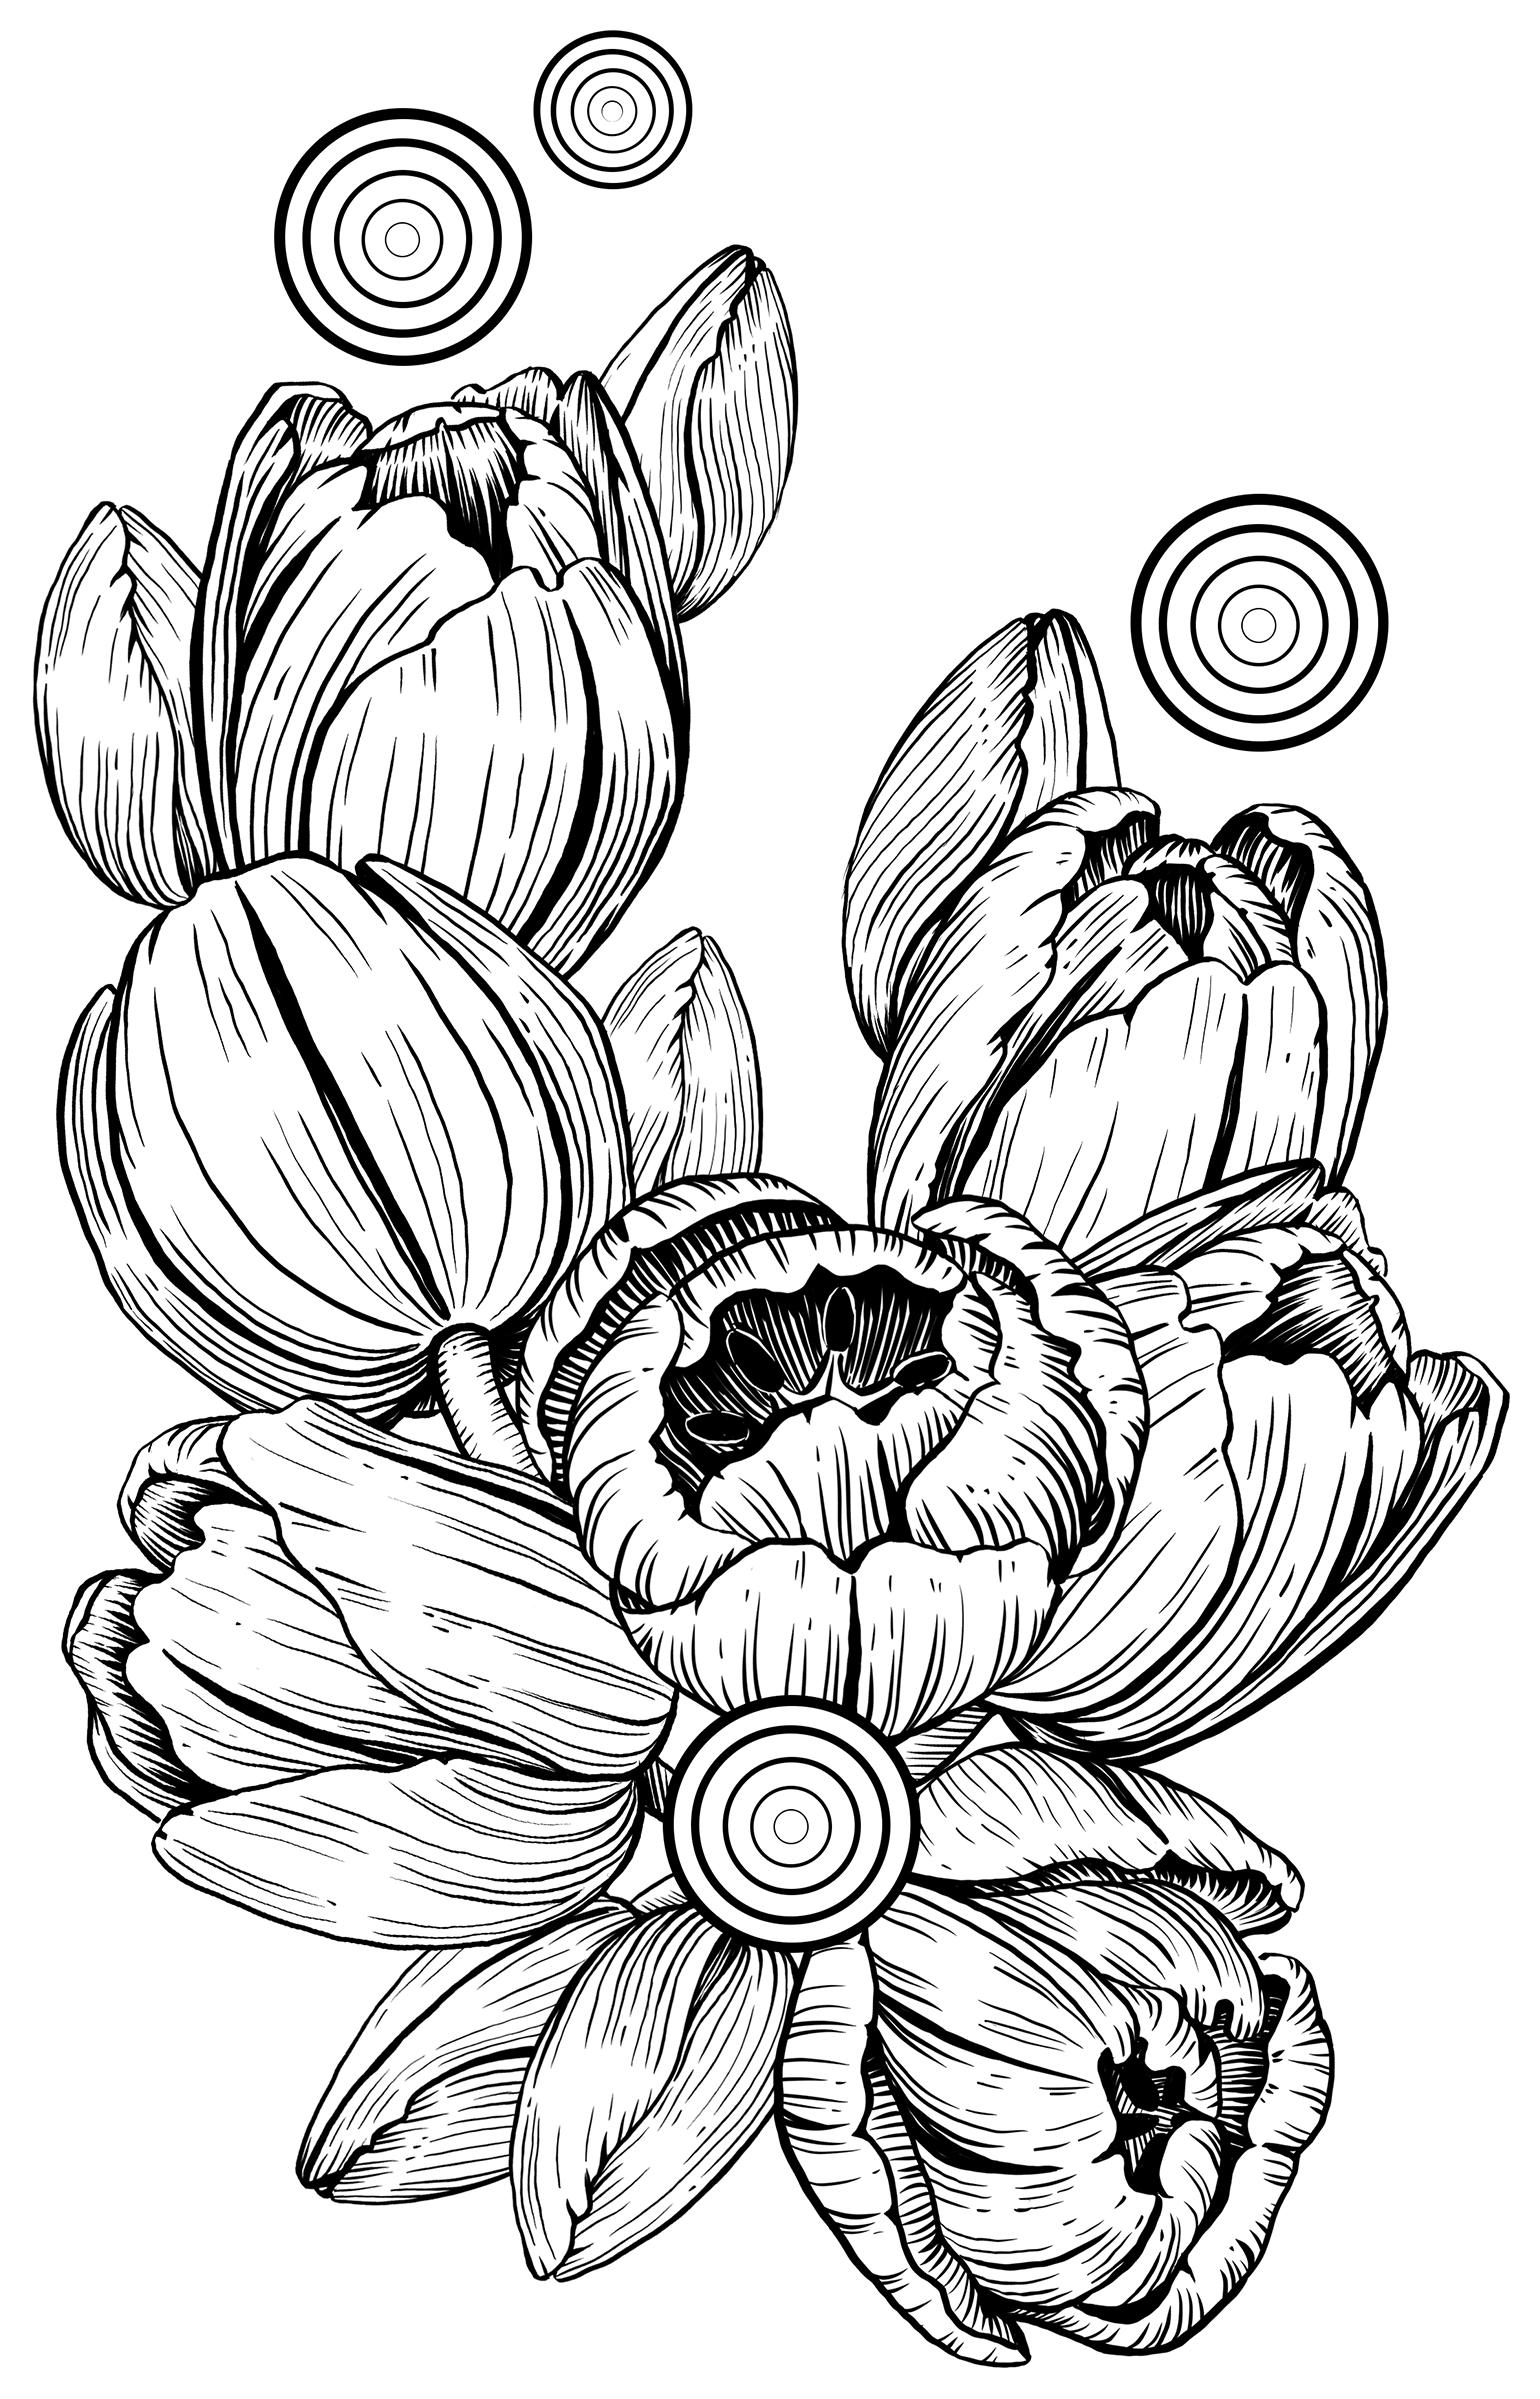 Tulpen_florale-Illustration_Pflanzenillustration_Melanie-Austermann_Meau-Design_Illustrator_Grafikdesigner_Komposition